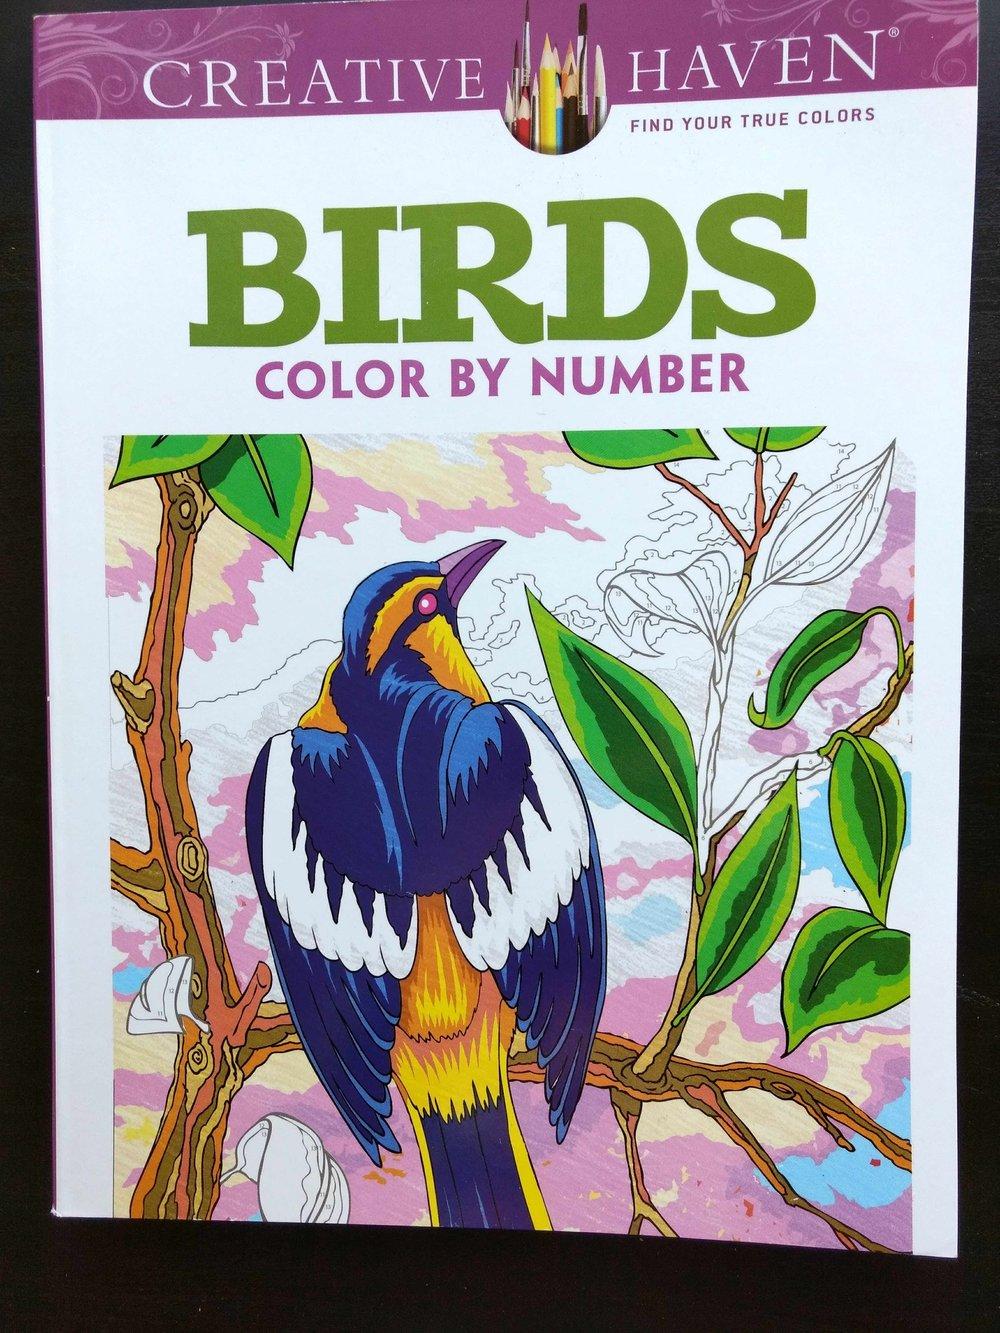 Creative Haven Birds.jpeg